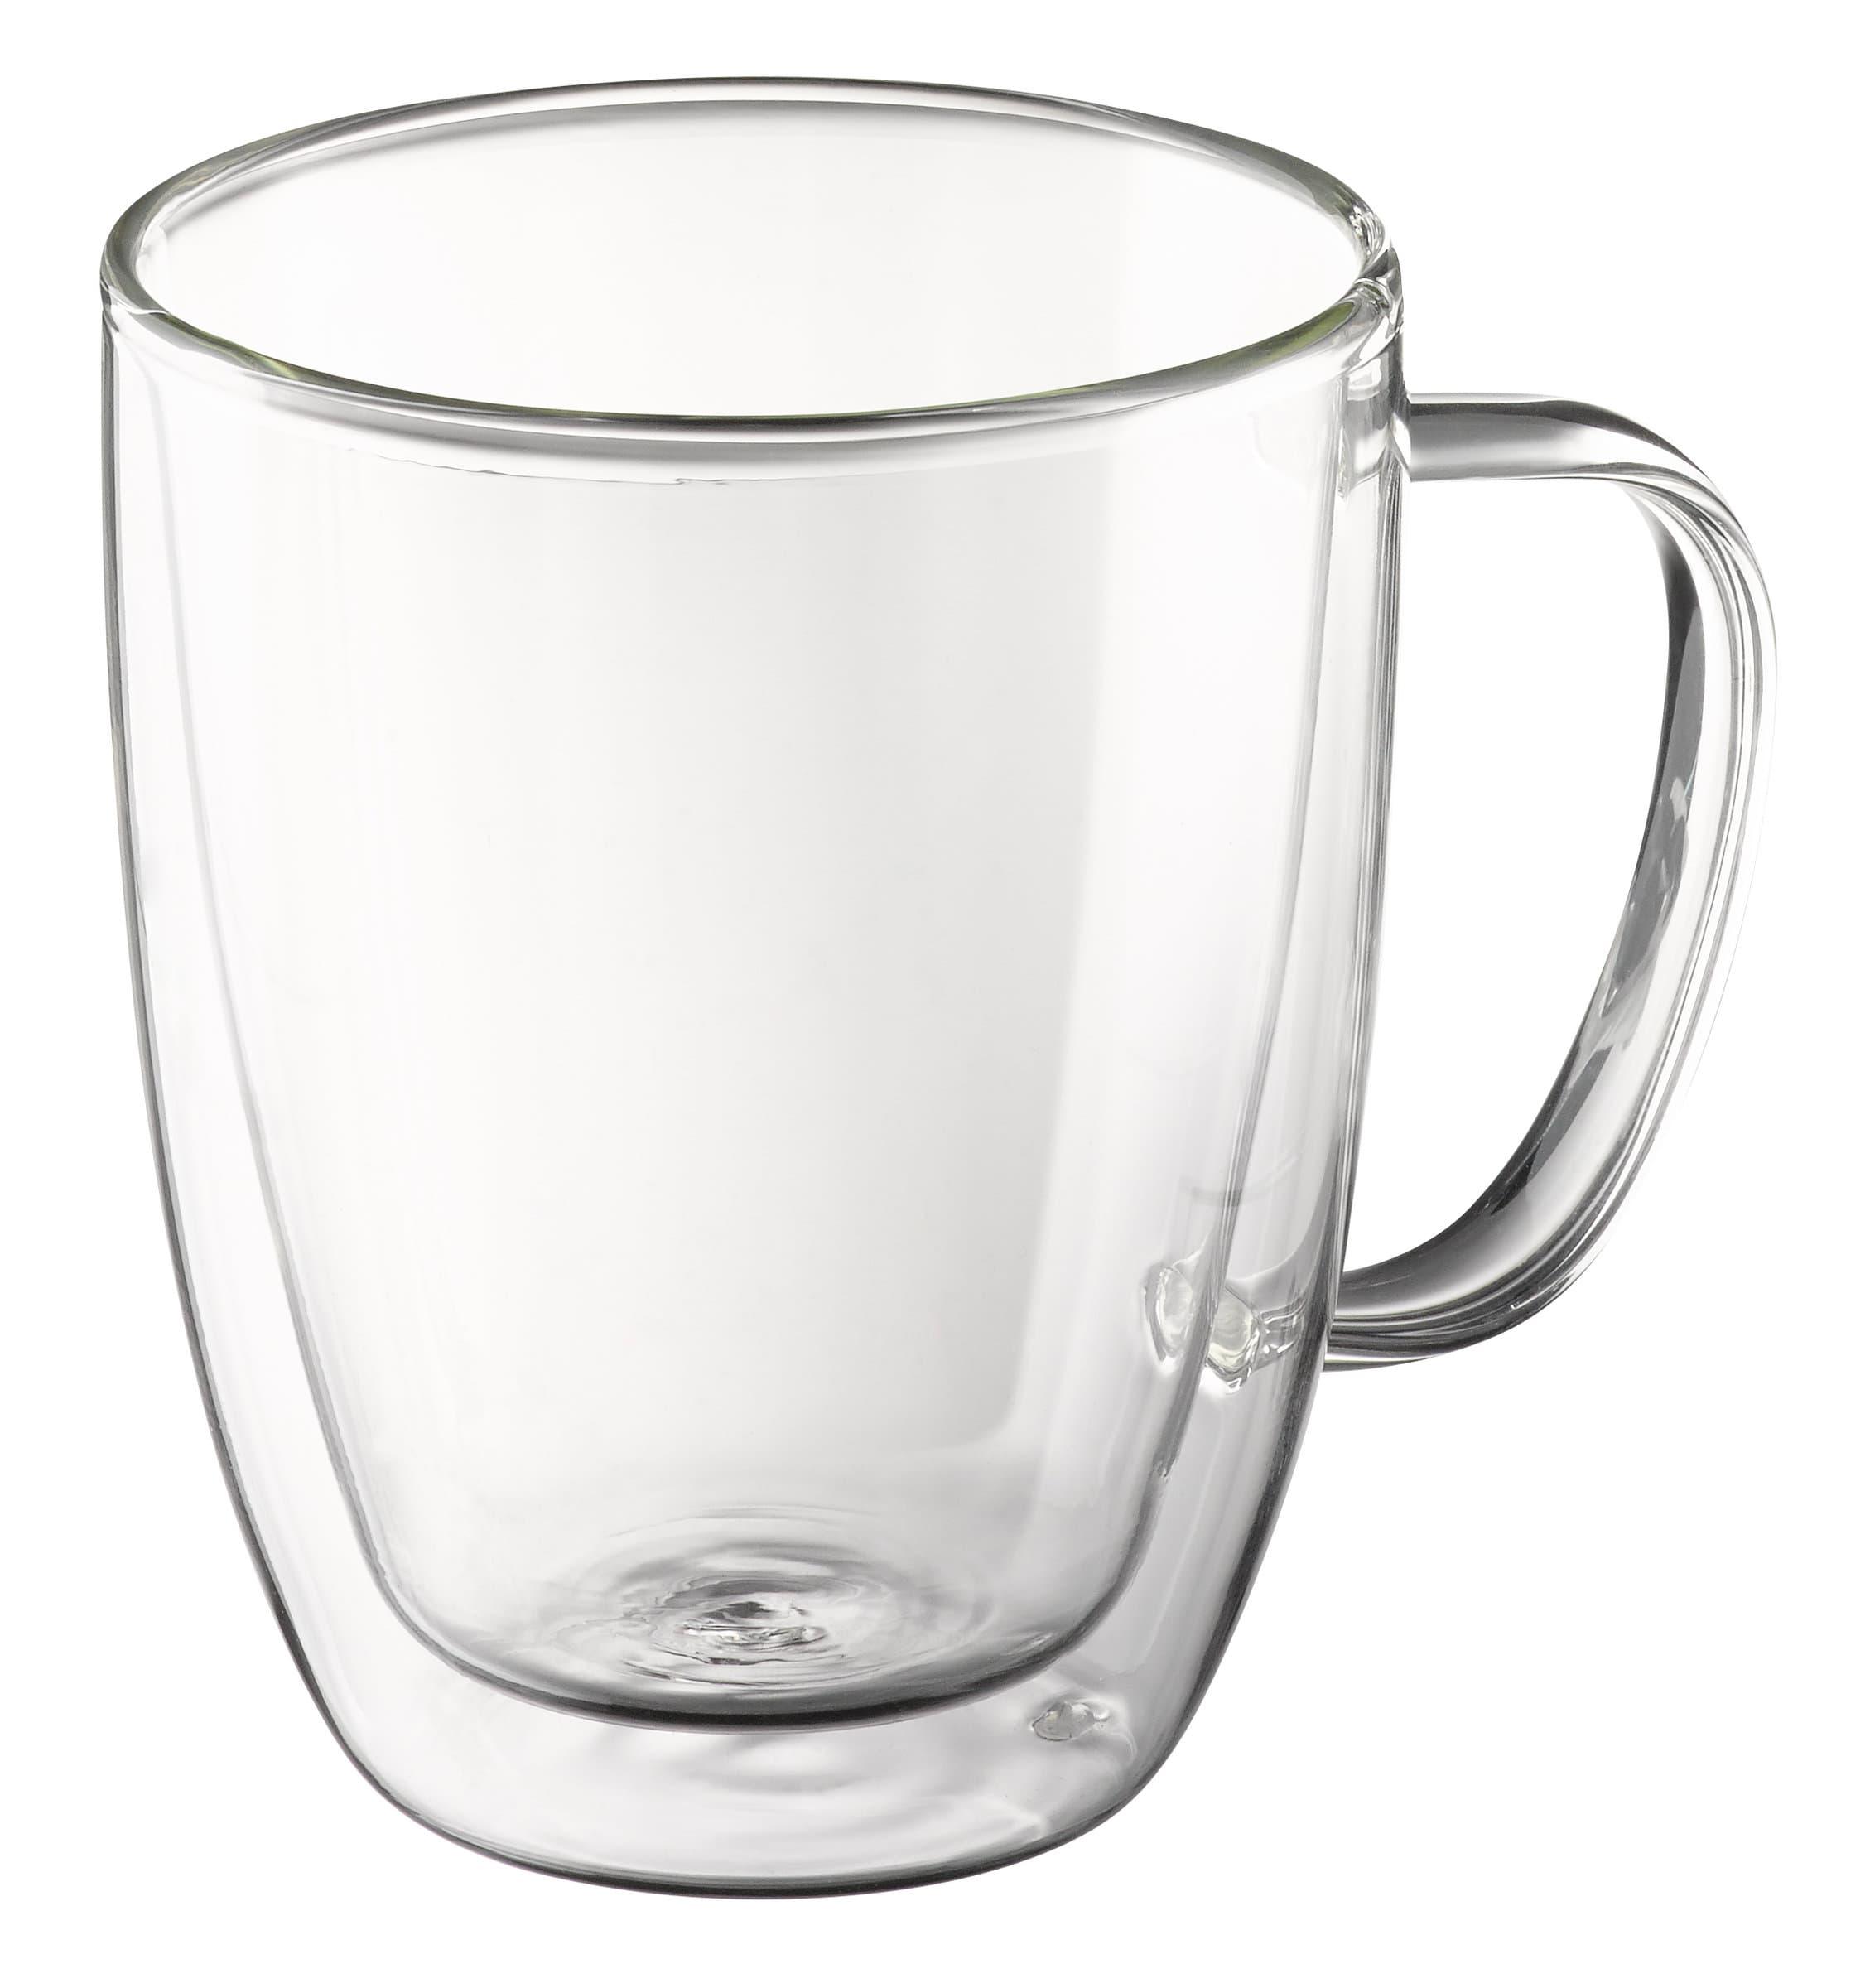 Cucina & Tavola Mug mit Henkel, doppelwandig, 400ml